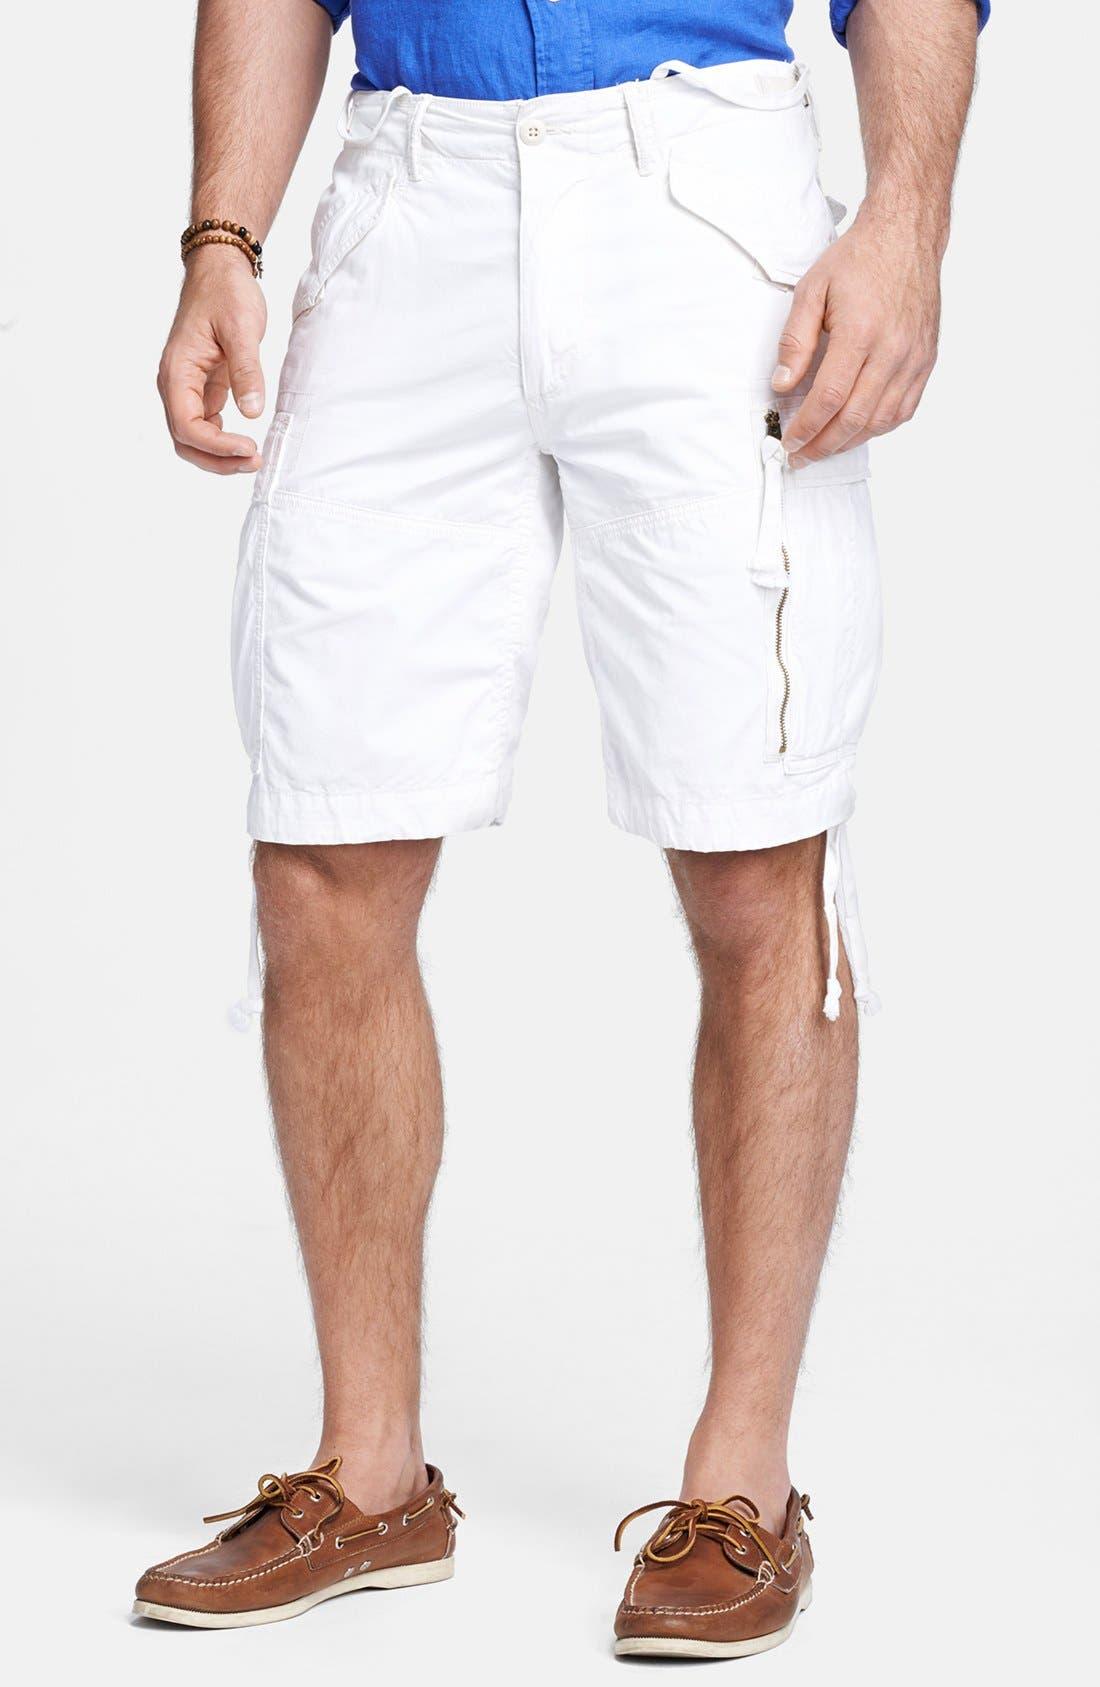 Main Image - Polo Ralph Lauren 'Carrier M45' Classic Fit Cargo Shorts